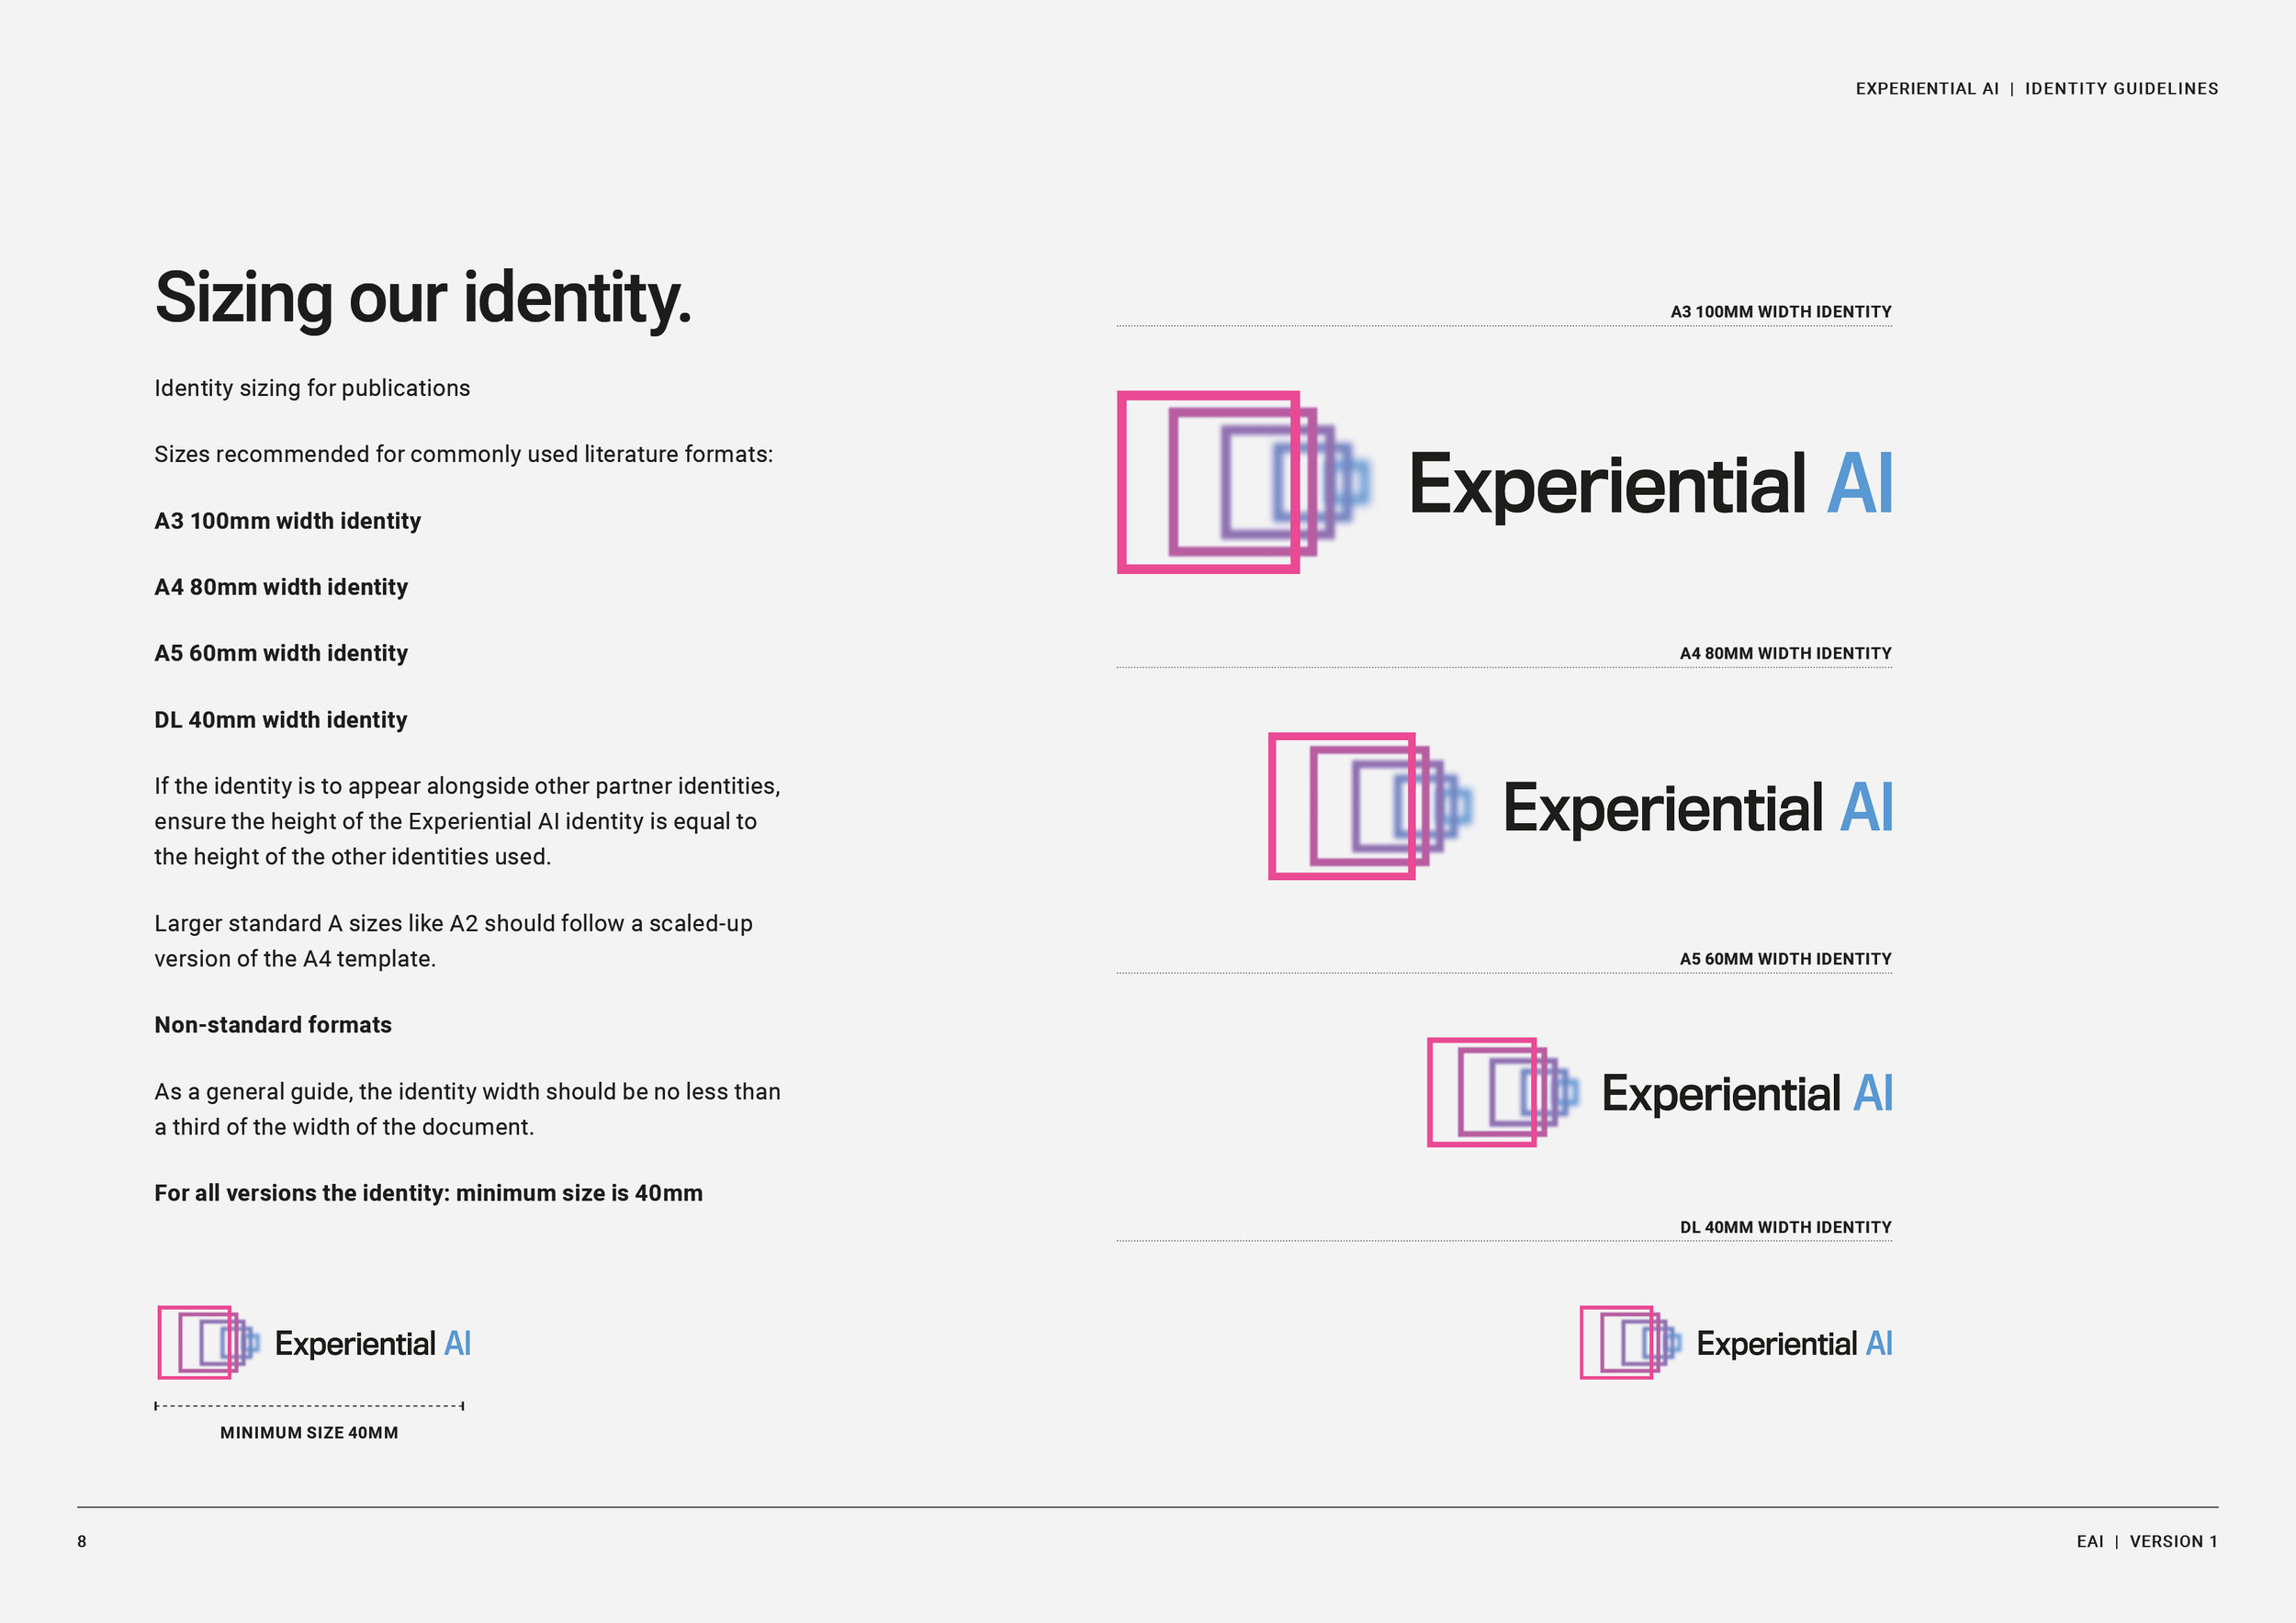 EAI_Identity_Guidelines8.jpg